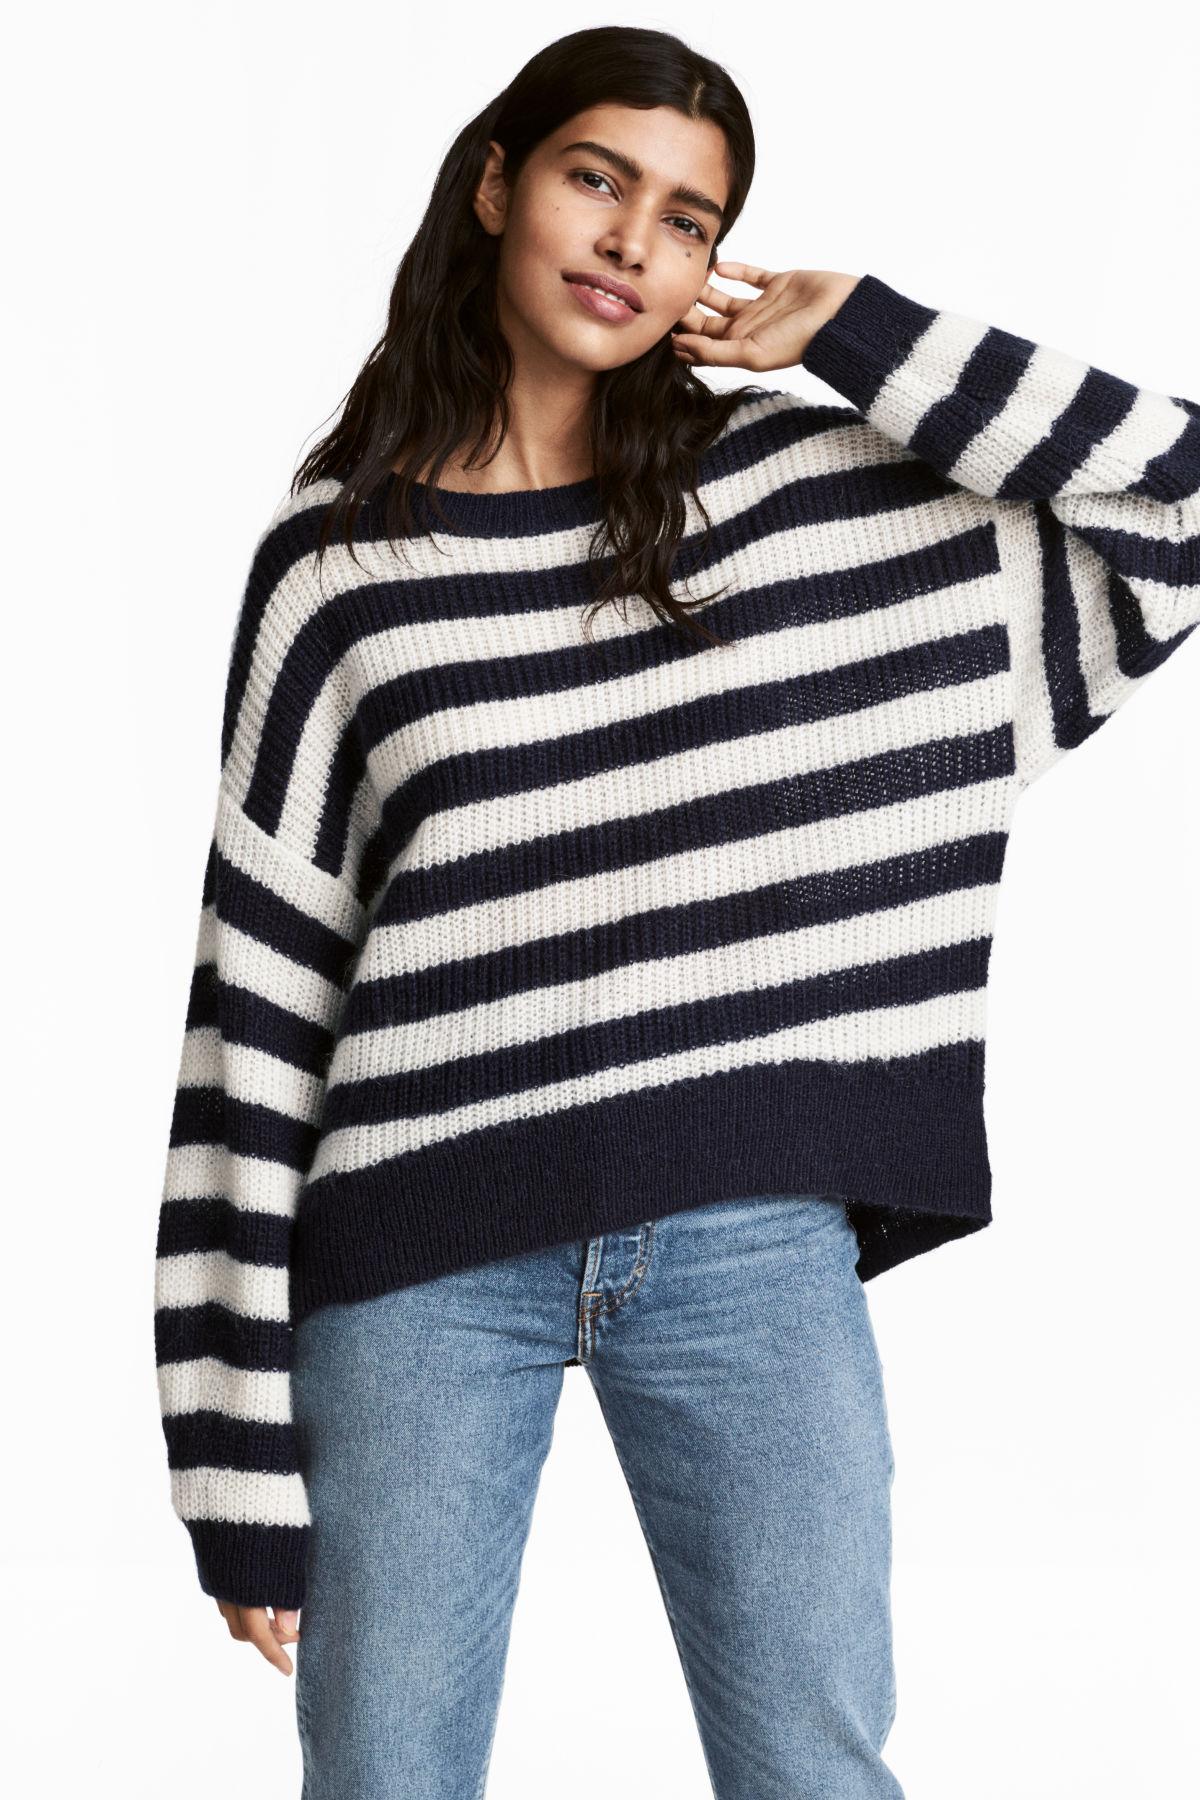 H&M Sweater $9.99